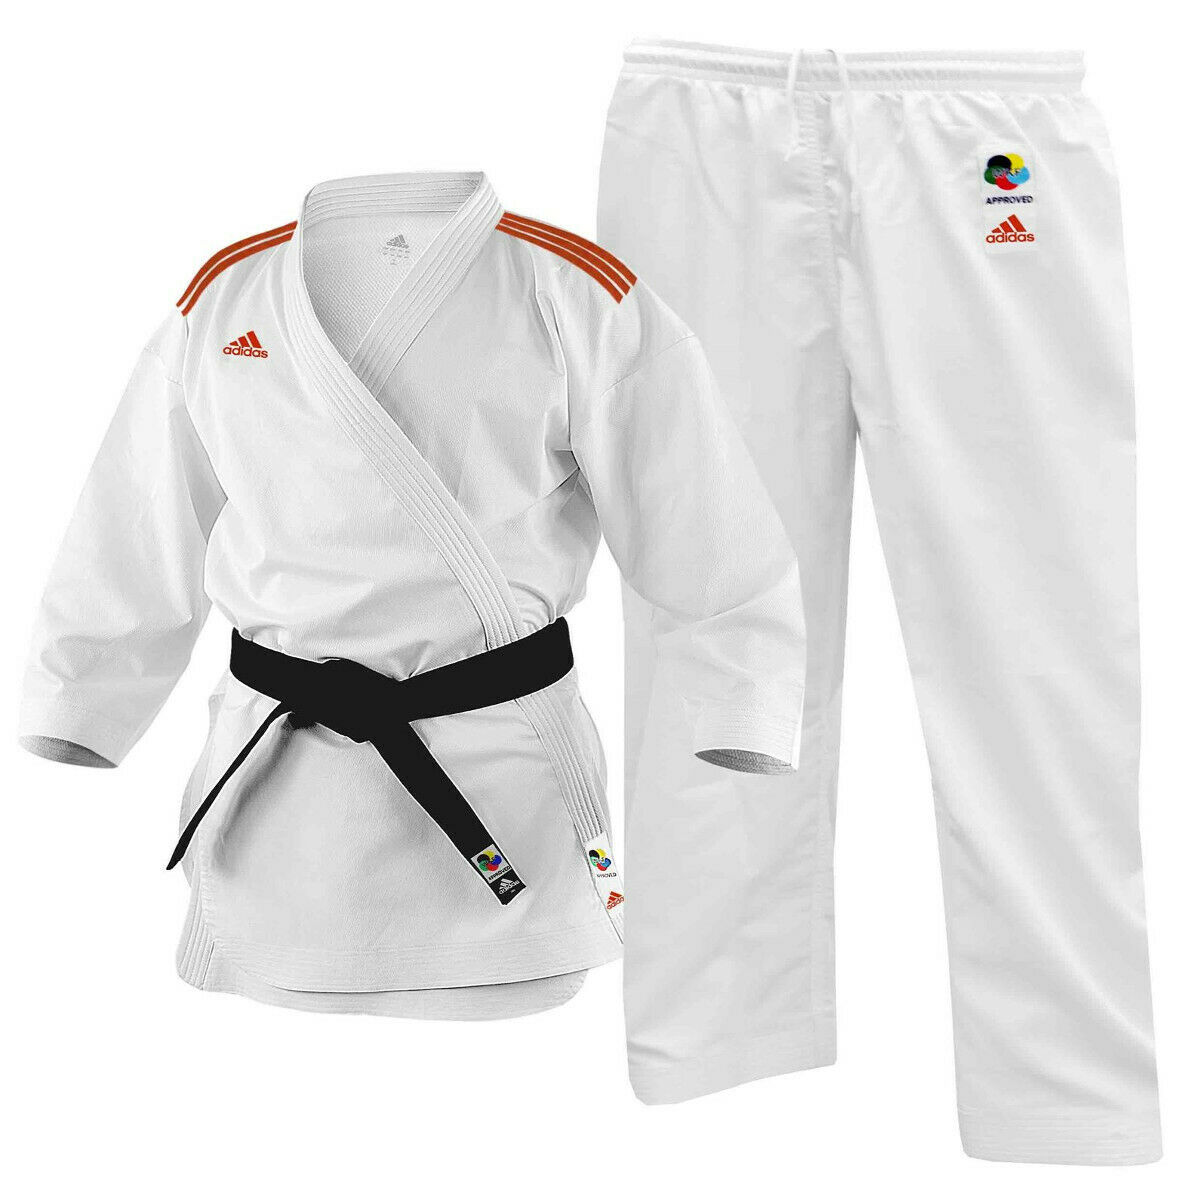 Karategi modellolo Kumite Adizero WKF Adidas  10102057R